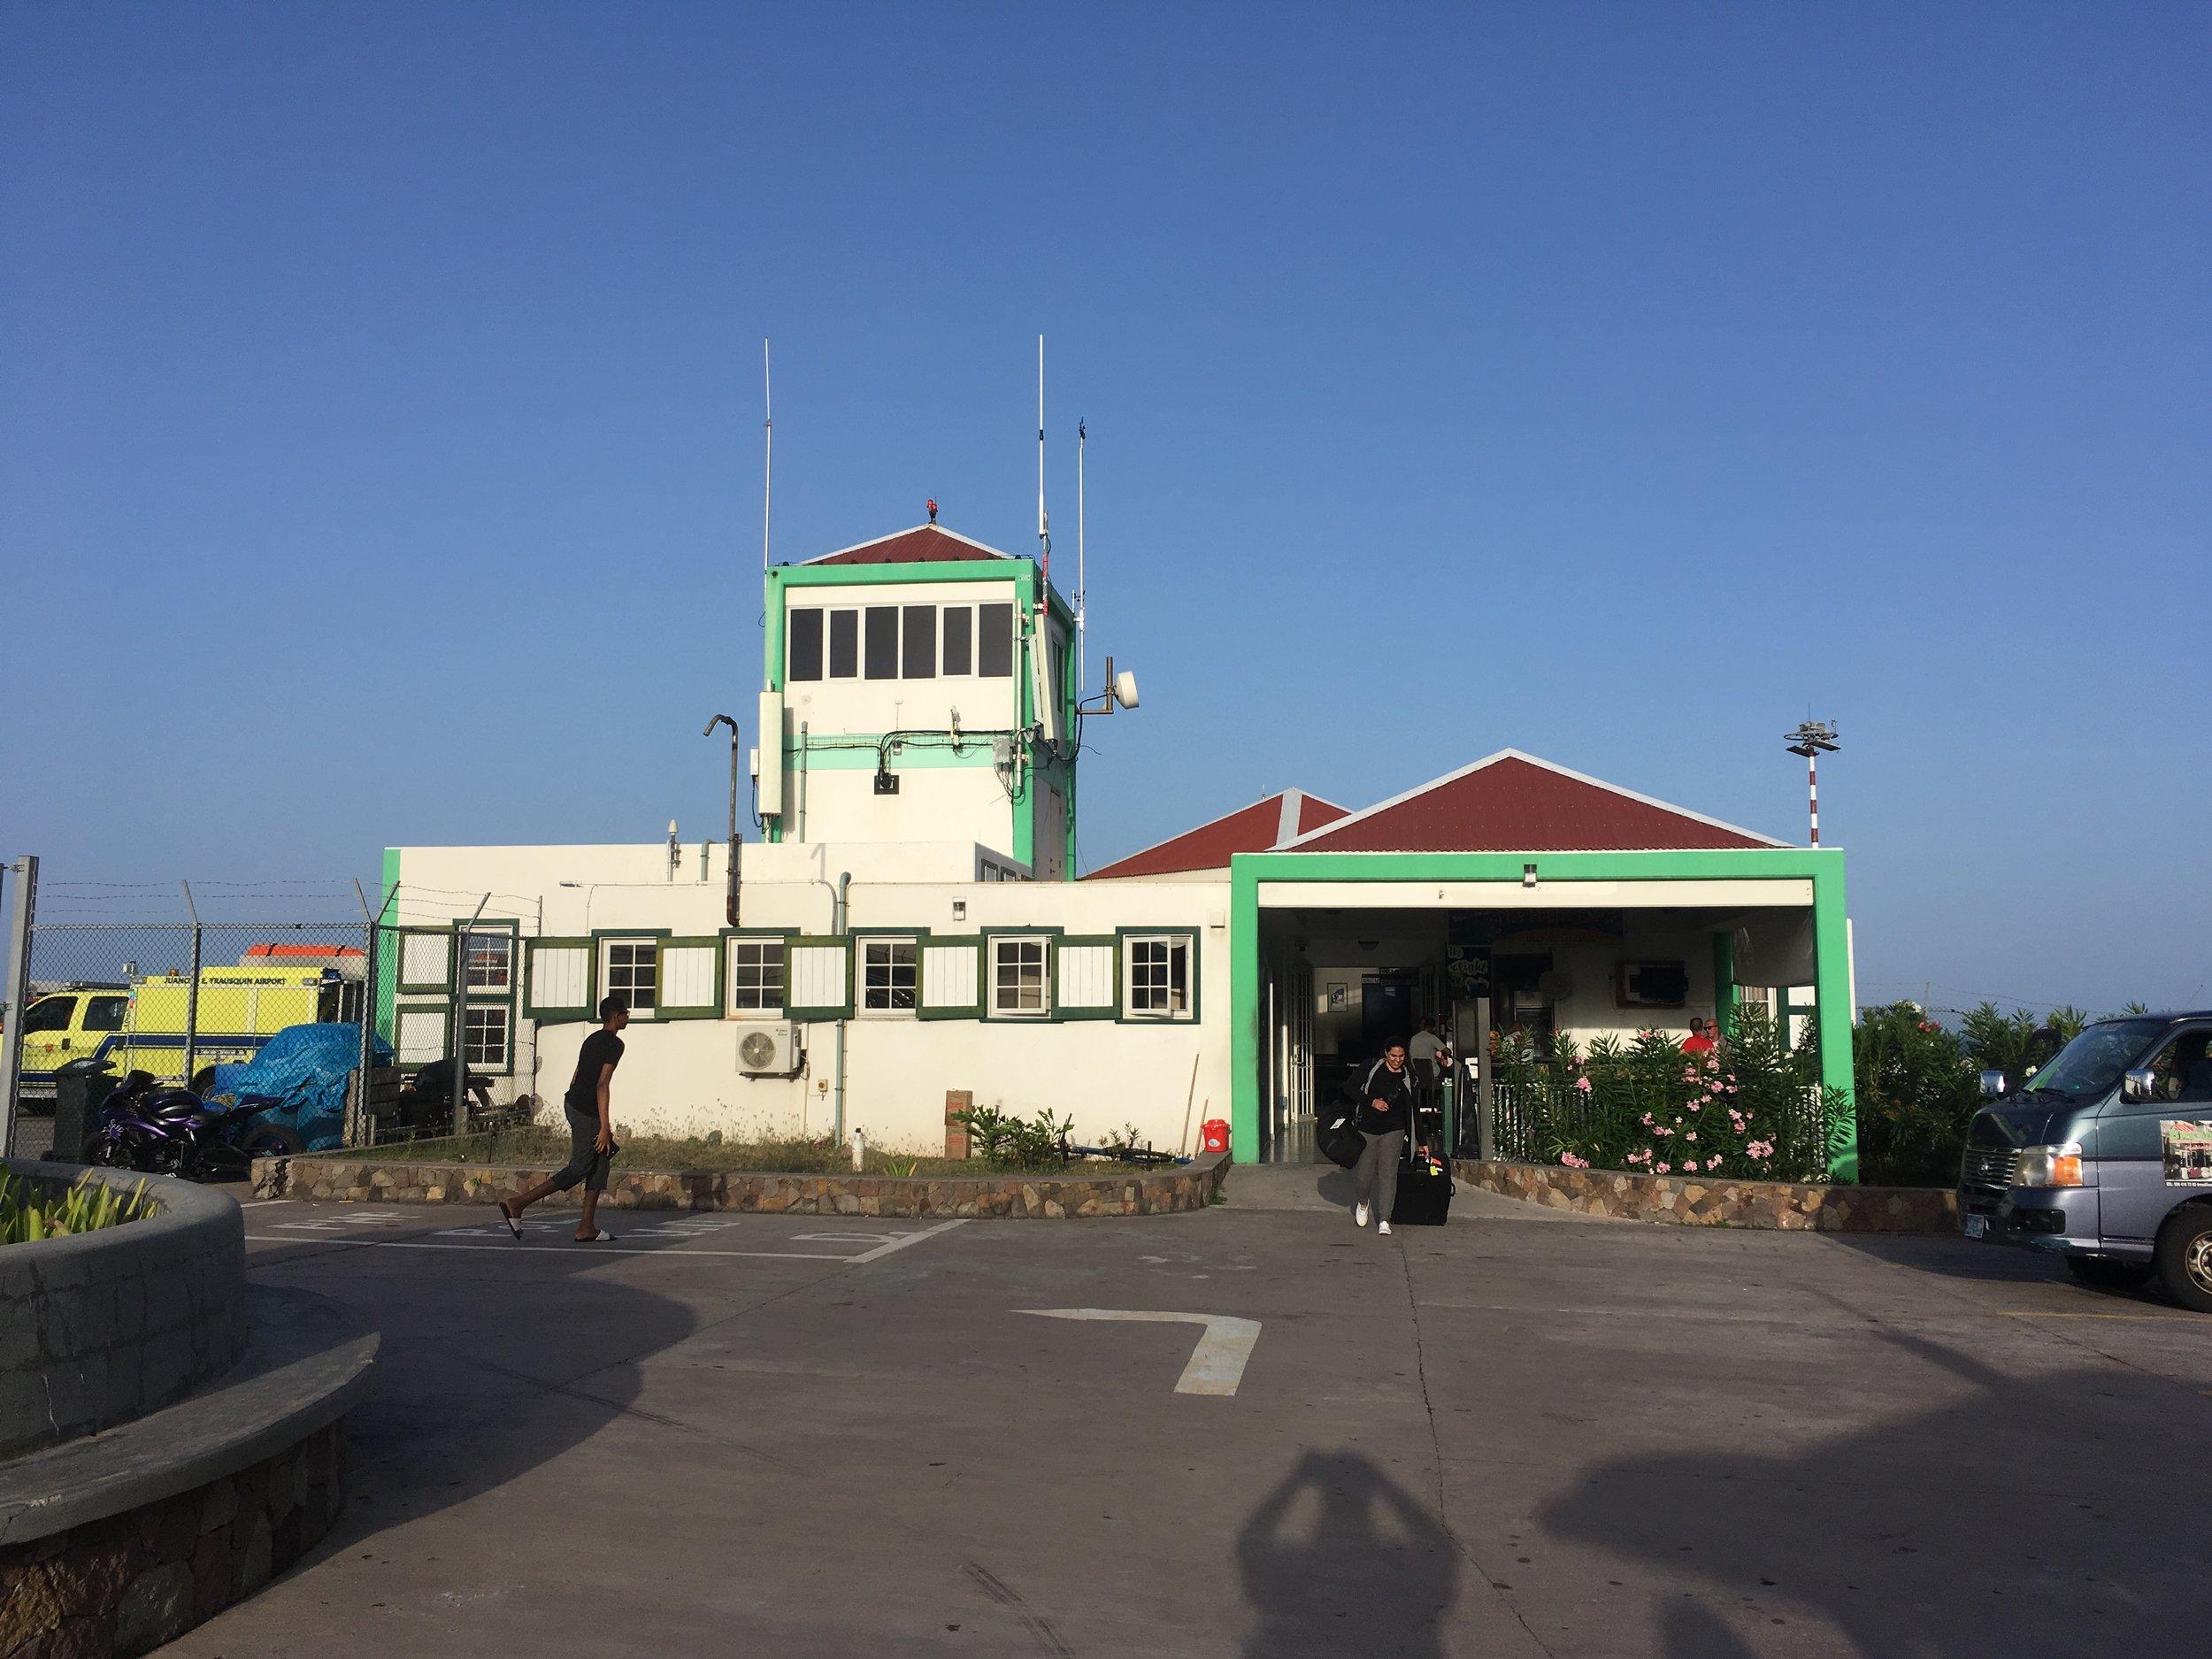 Juancho E. Yrausquin airport.